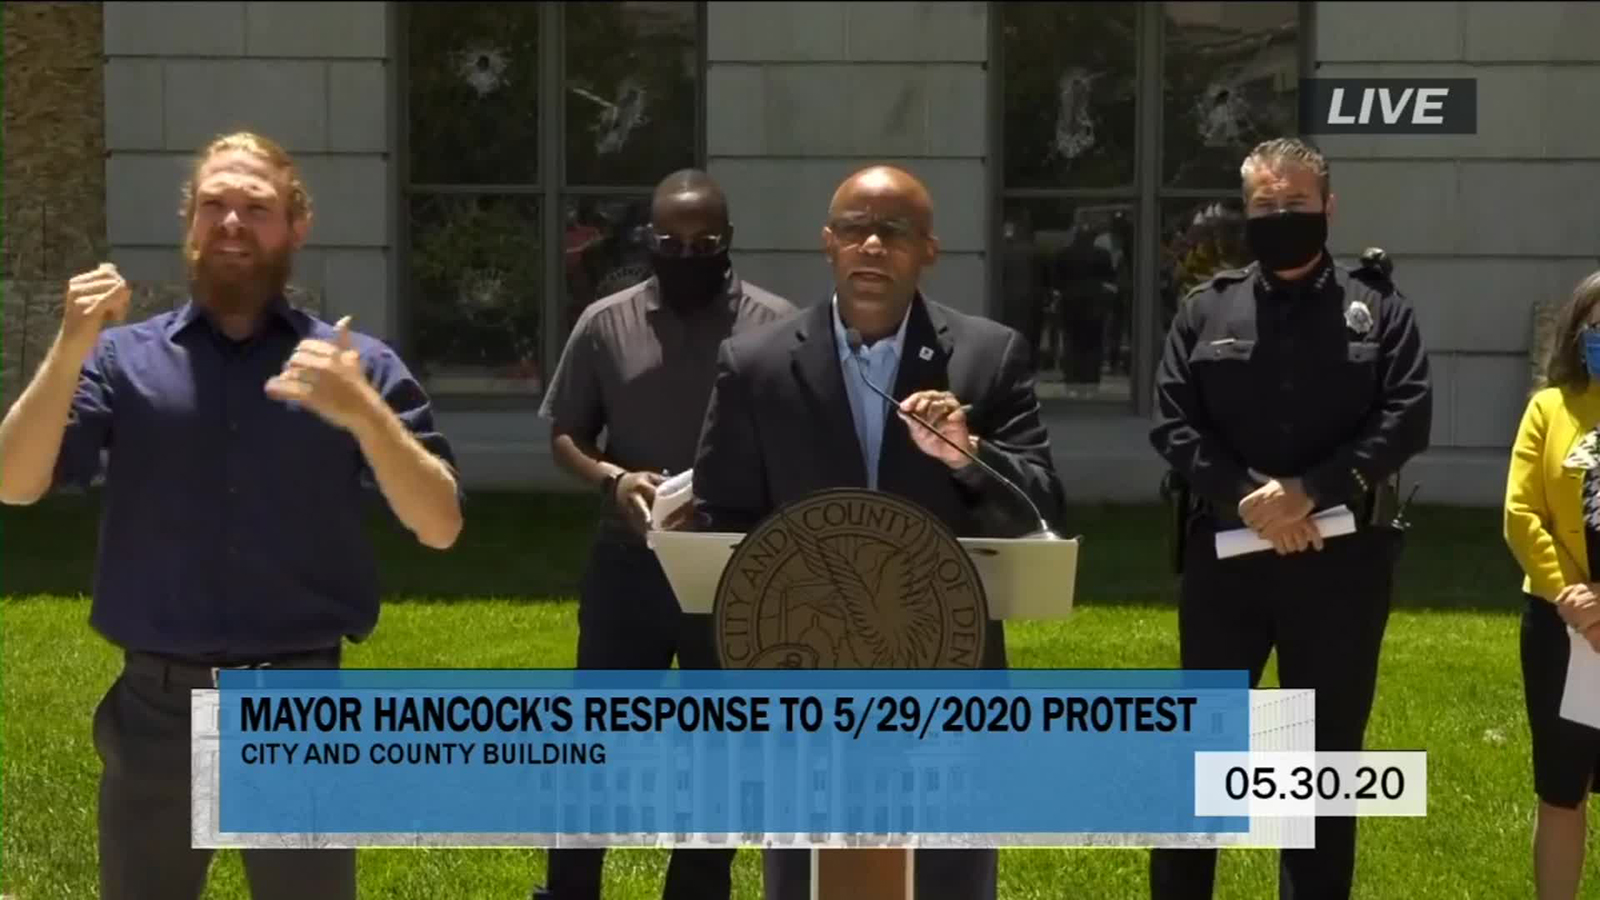 Denver Mayor Michael B. Hancock speaks at a news conference in Denver, on May 30.